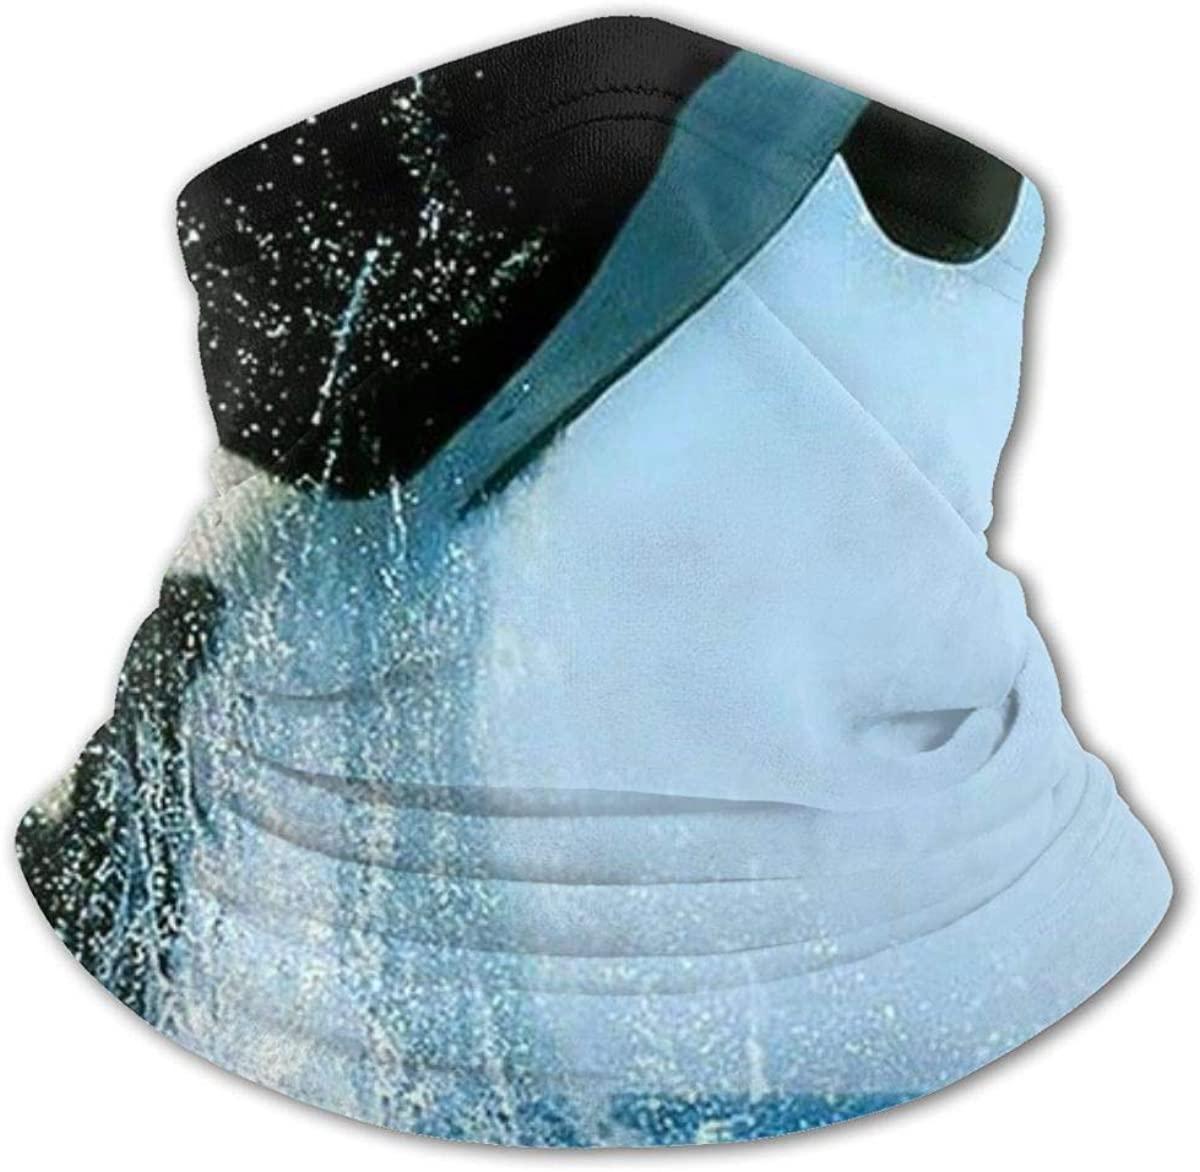 Killer Whales Headwear For Girls And Boys, Head Wrap, Neck Gaiter, Headband, Tenn Fishing Mask, Magic Scarf, Tube Mask, Face Bandana Mask For Camping Running Cycling